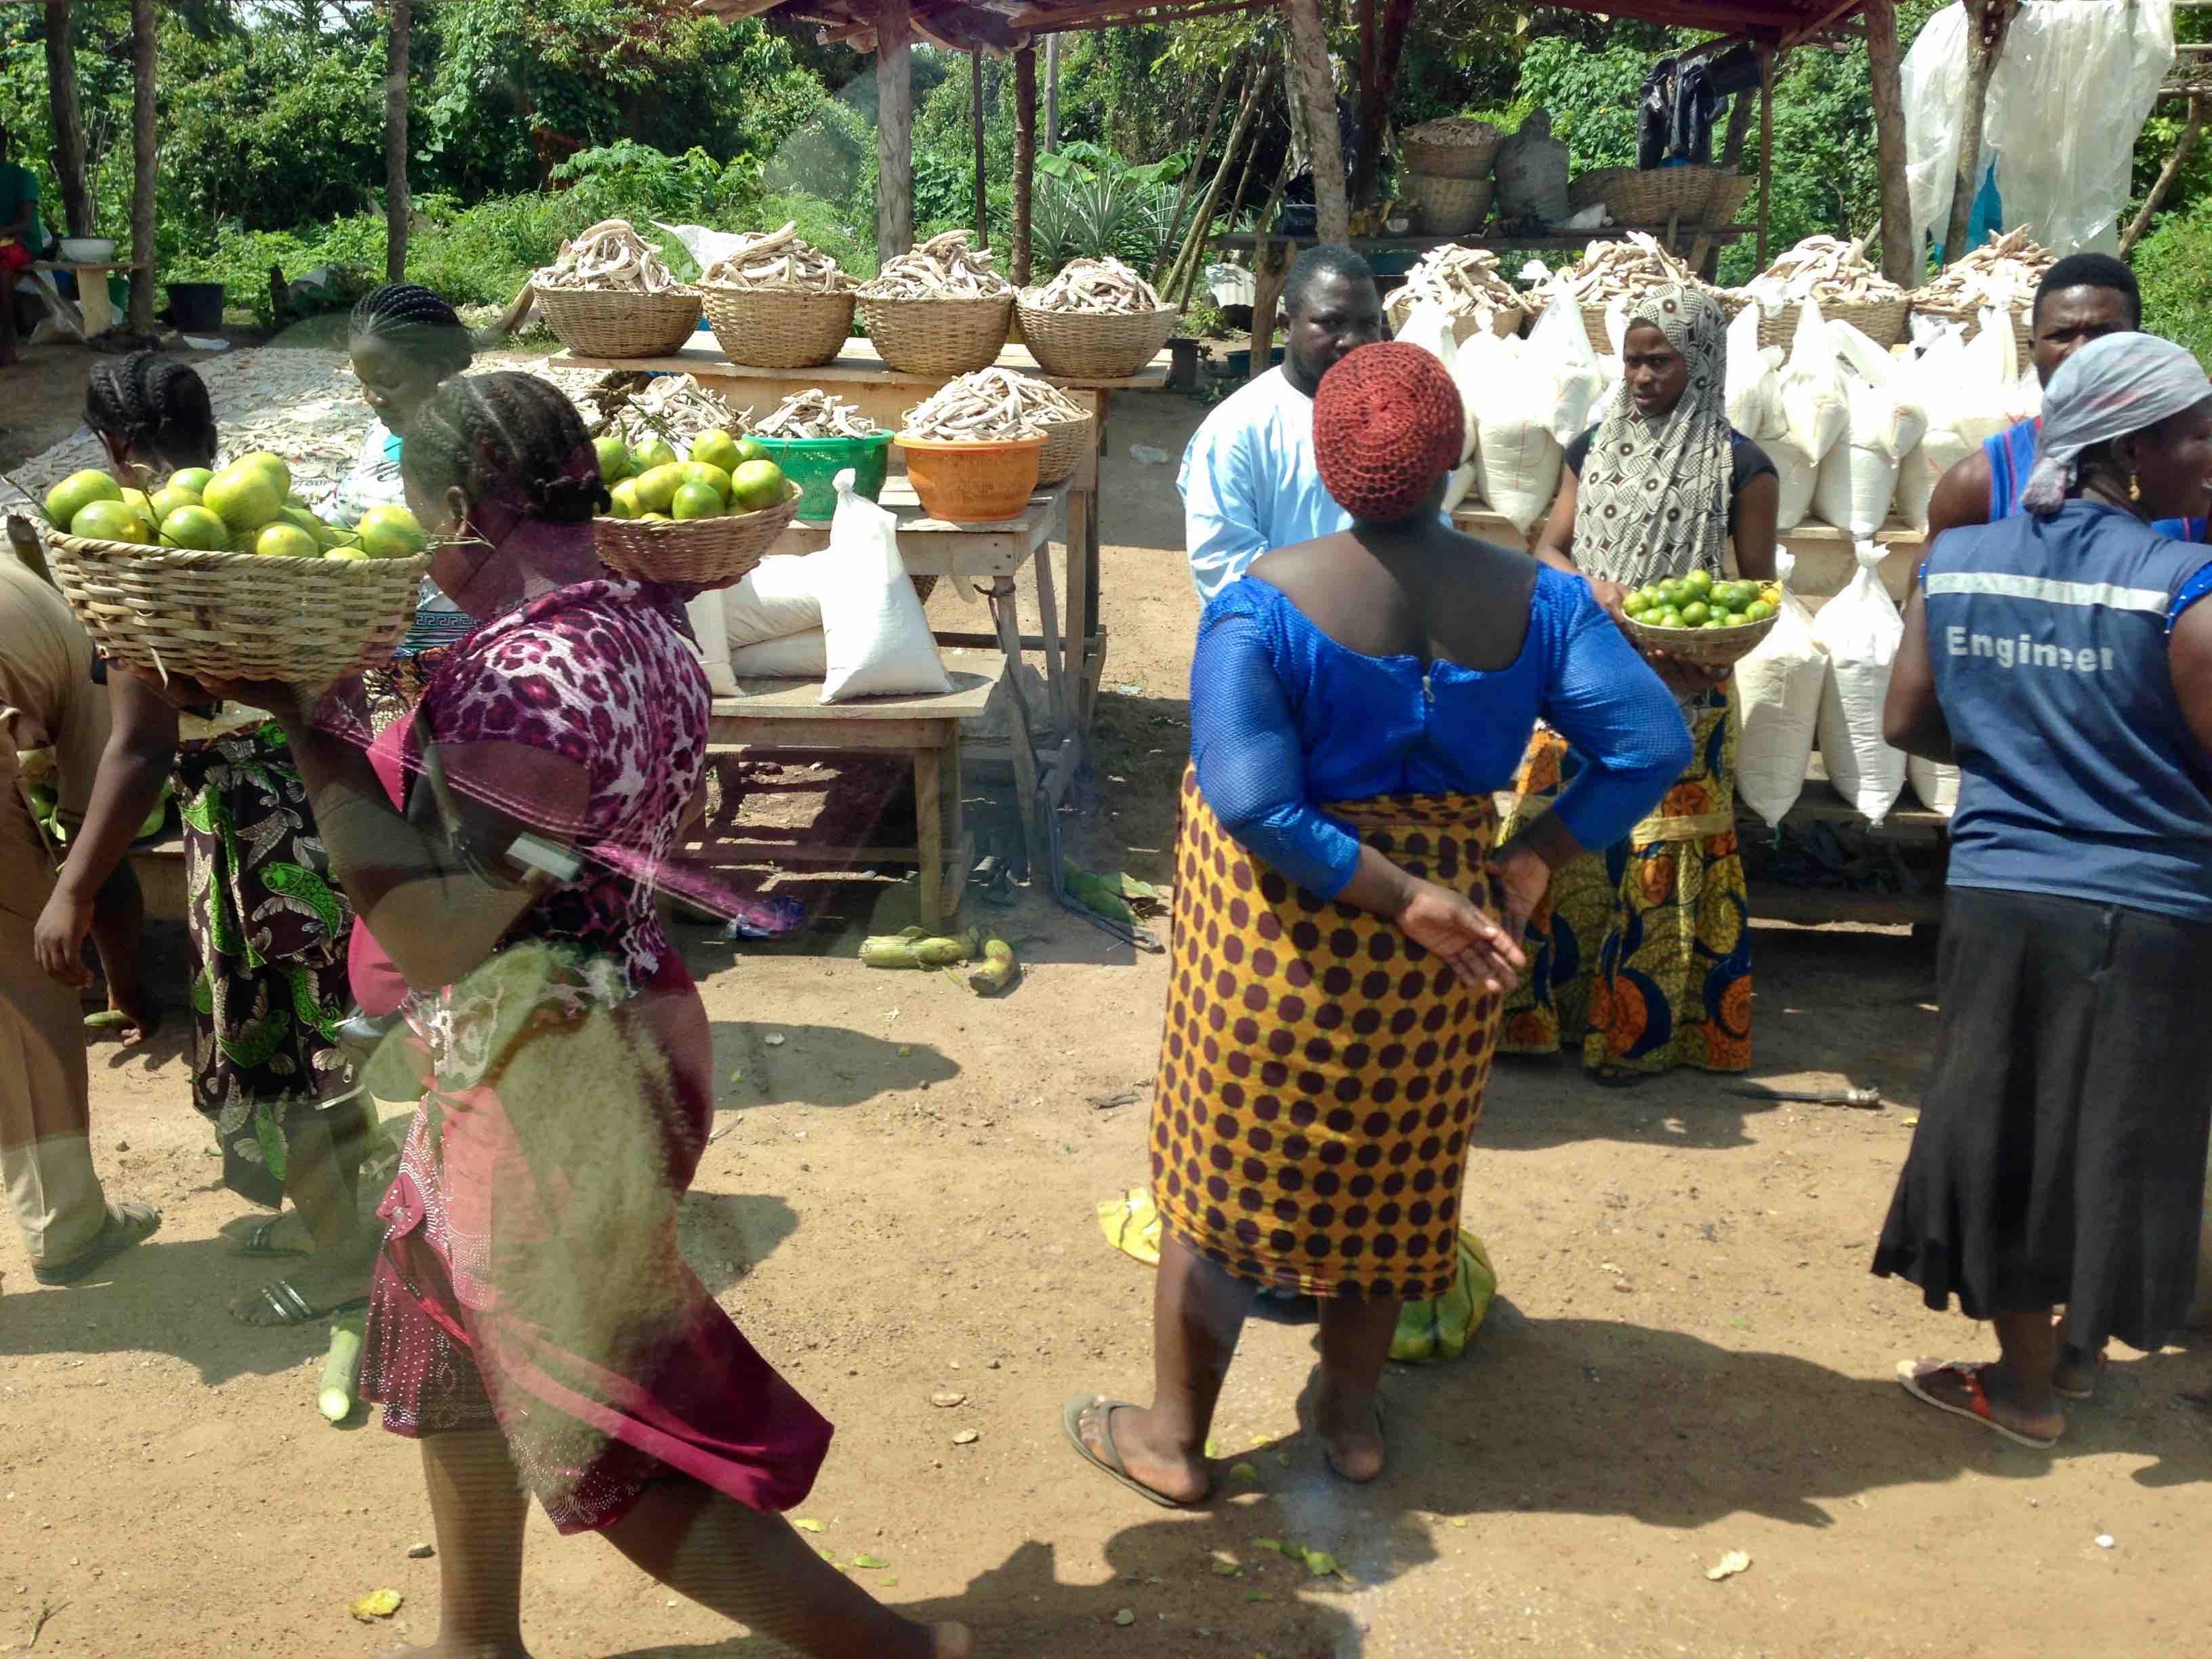 Roadside Market, Akure - Owo - Ifon - Benin Road, Ondo State, Nigeria. #JujuFilms